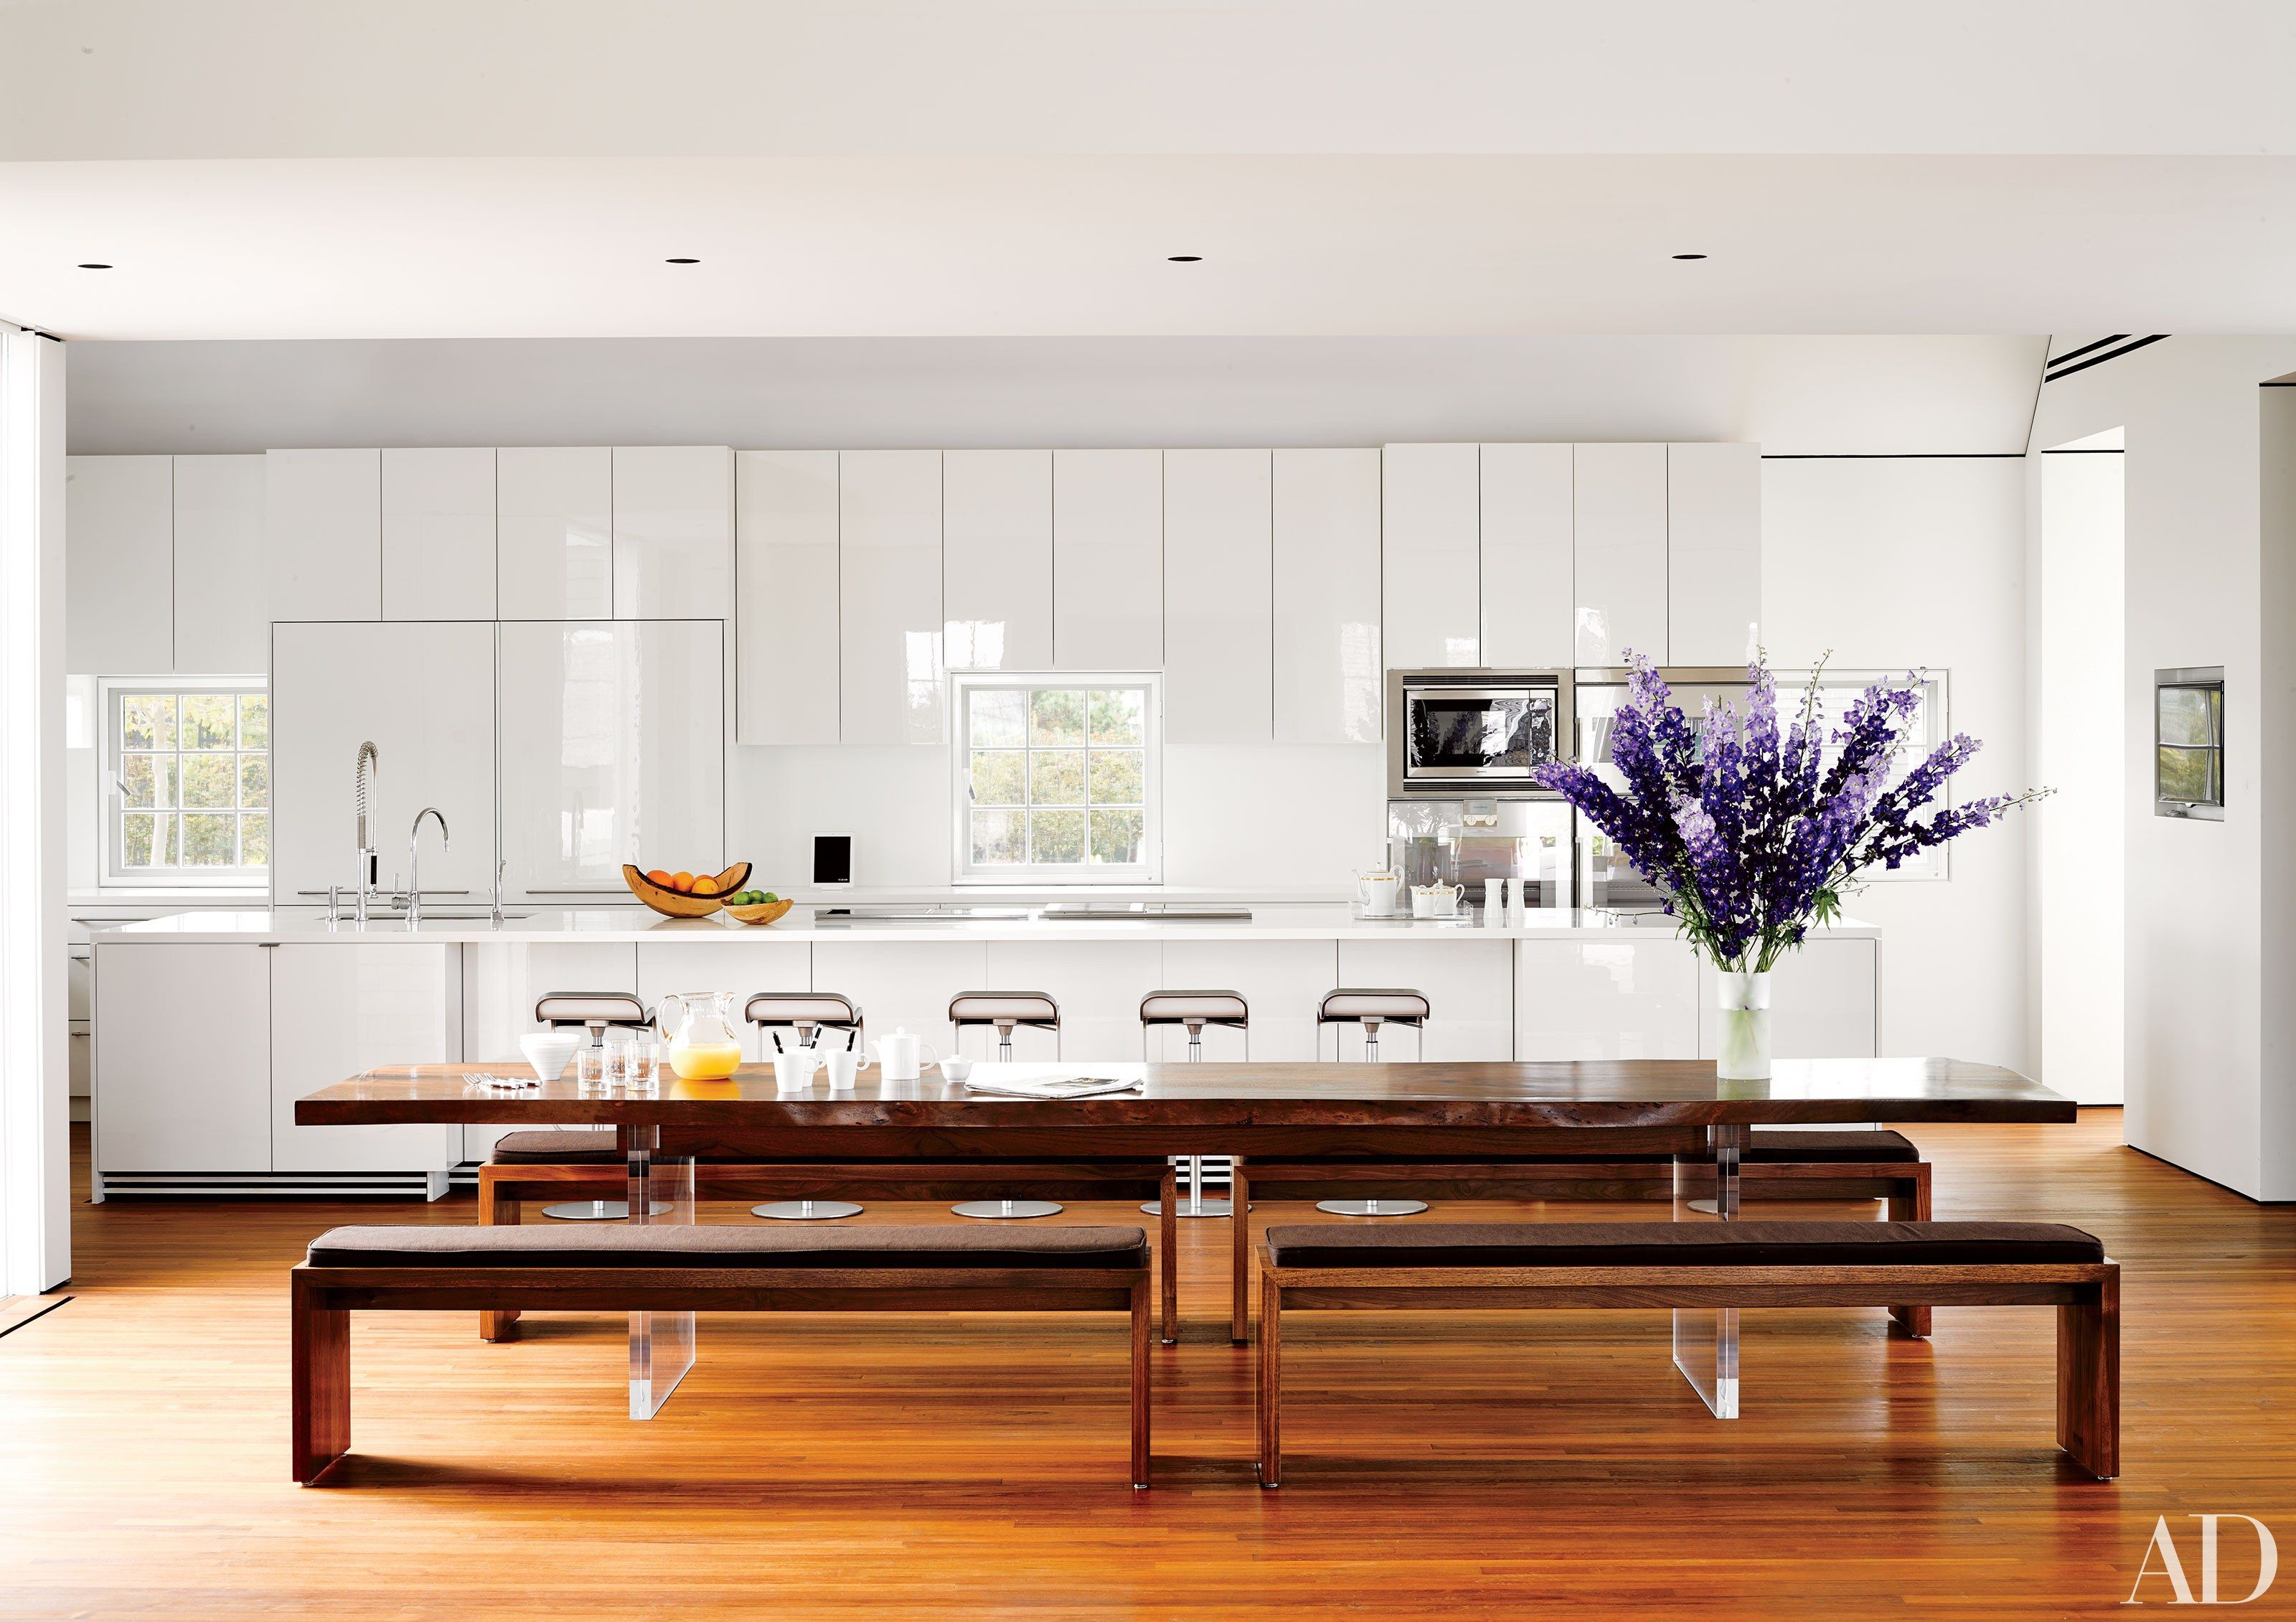 White Kitchens Design Ideas  Architectural Digest Kitchens And Pleasing Kitchen Design Massachusetts Design Inspiration